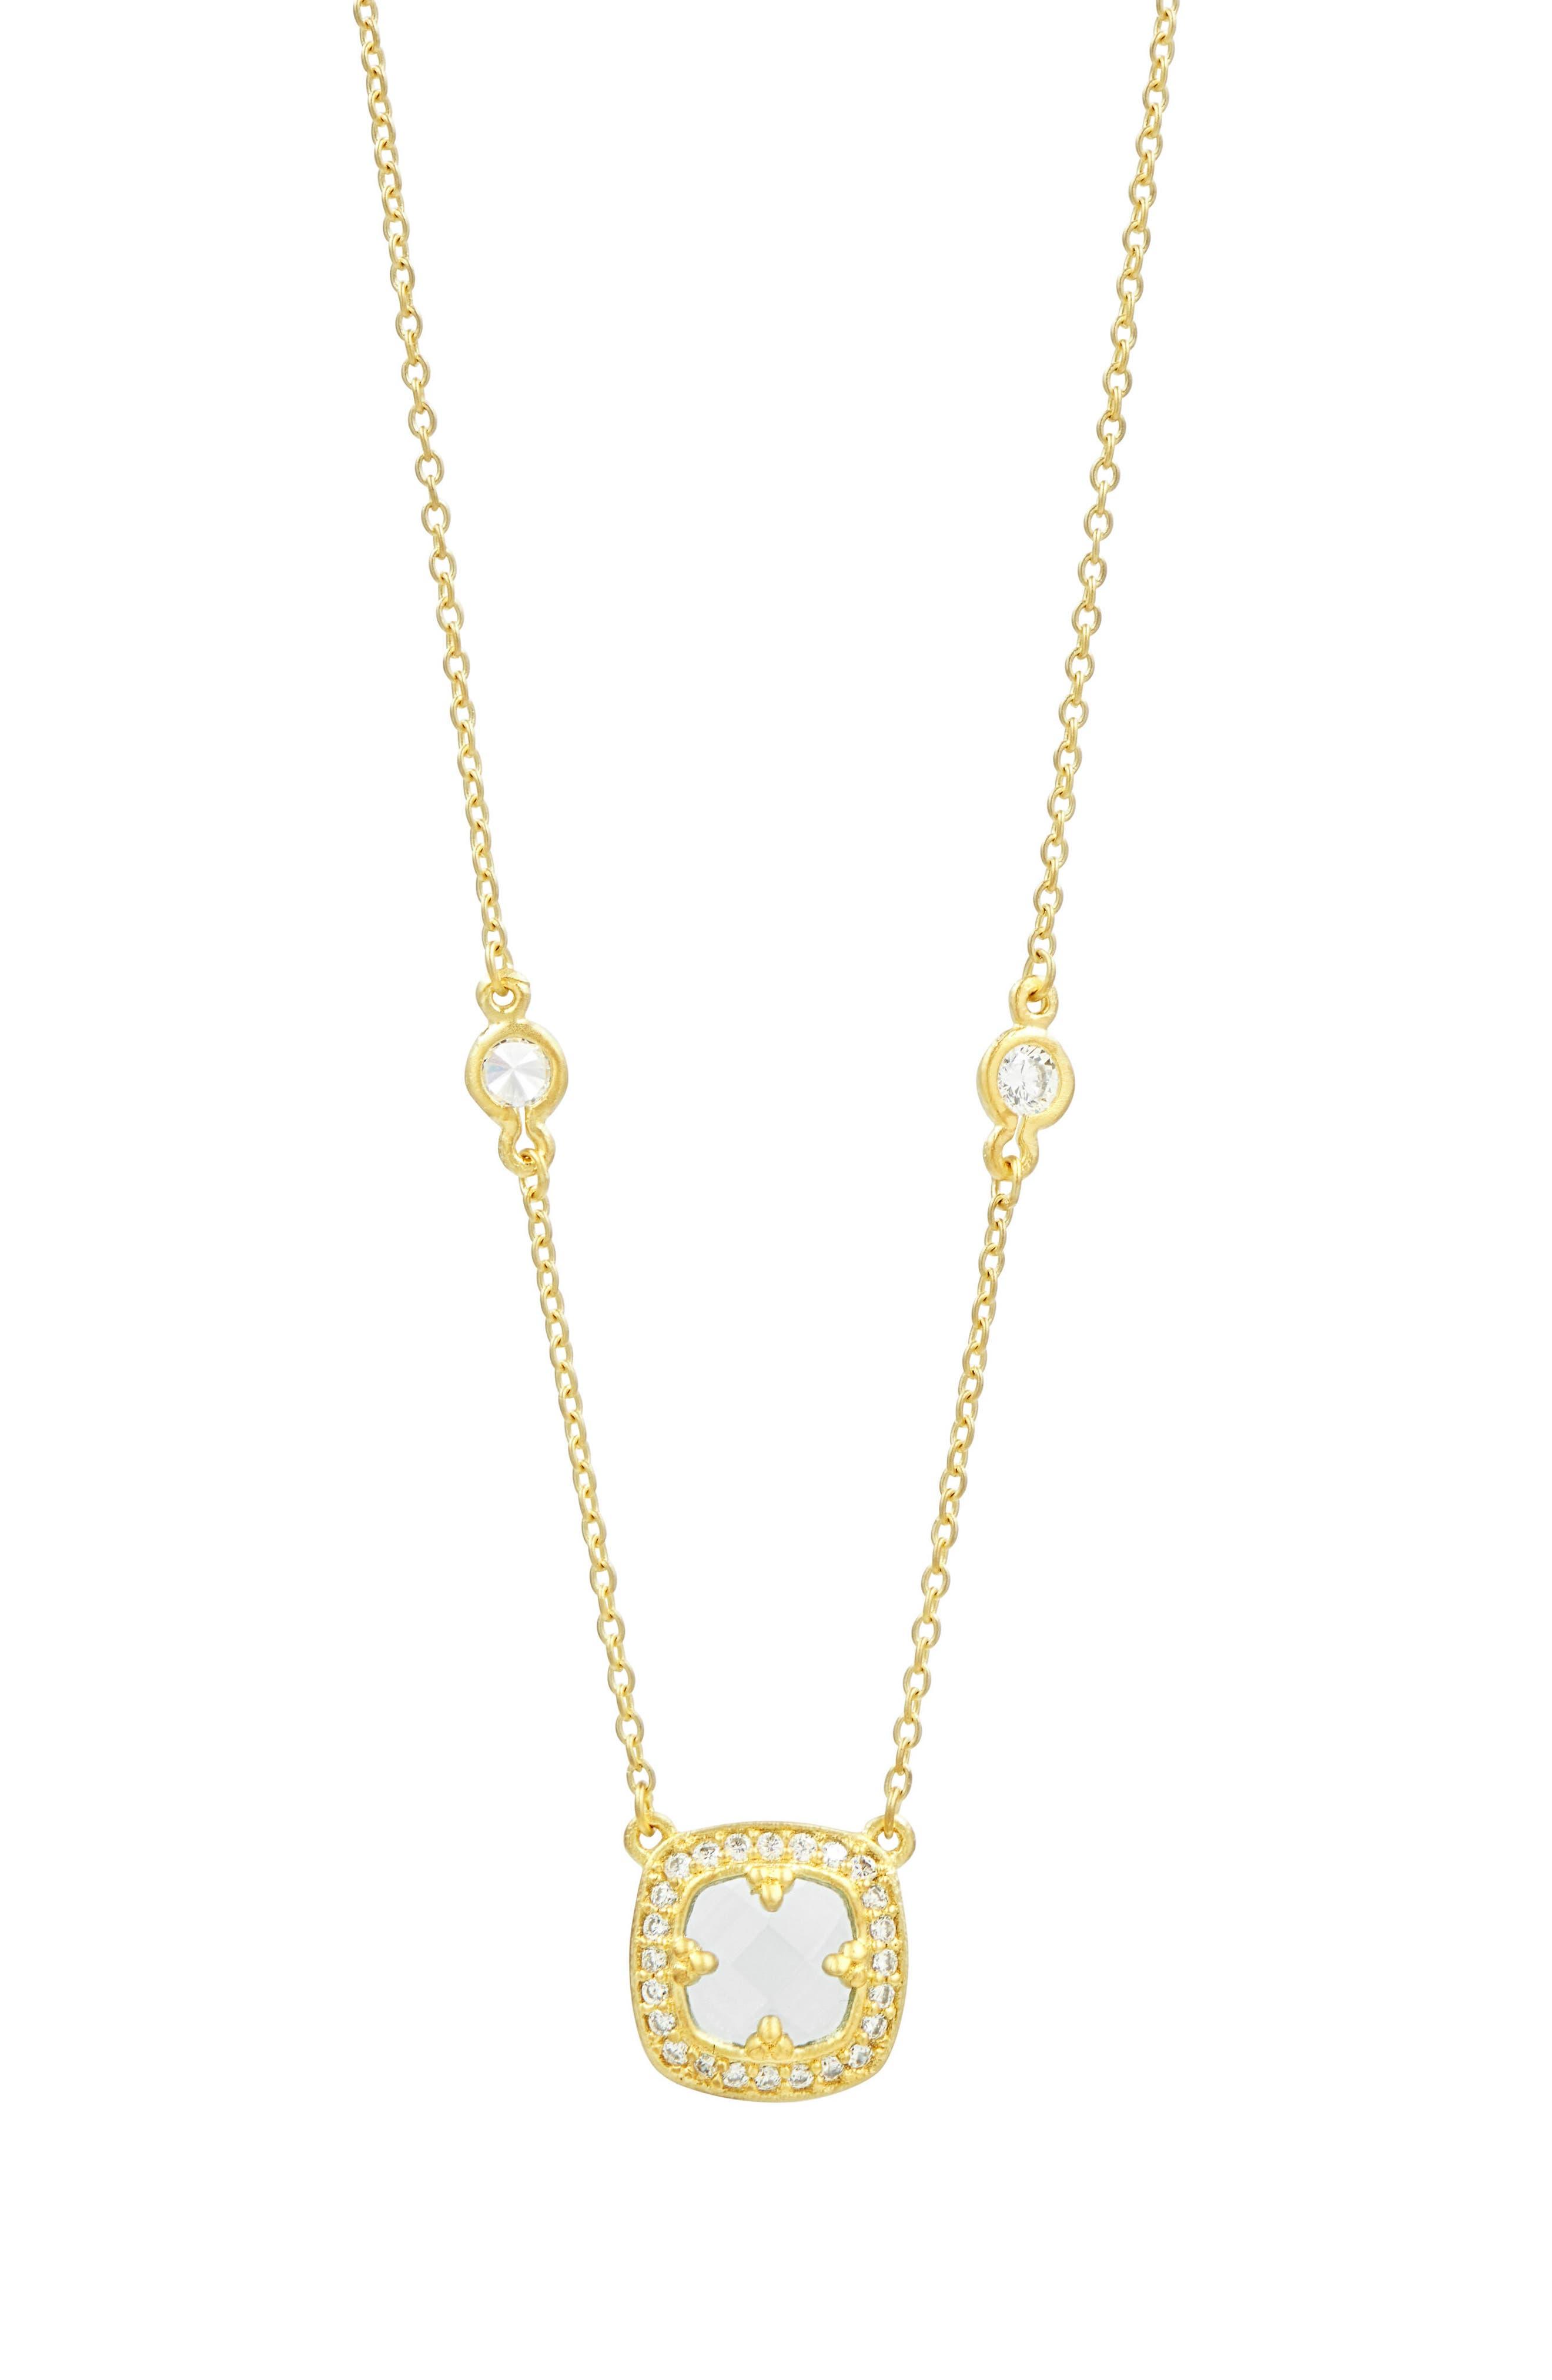 Ocean Azure Cubic Zirconia Pendant Necklace,                             Main thumbnail 1, color,                             GOLD/ AQUA